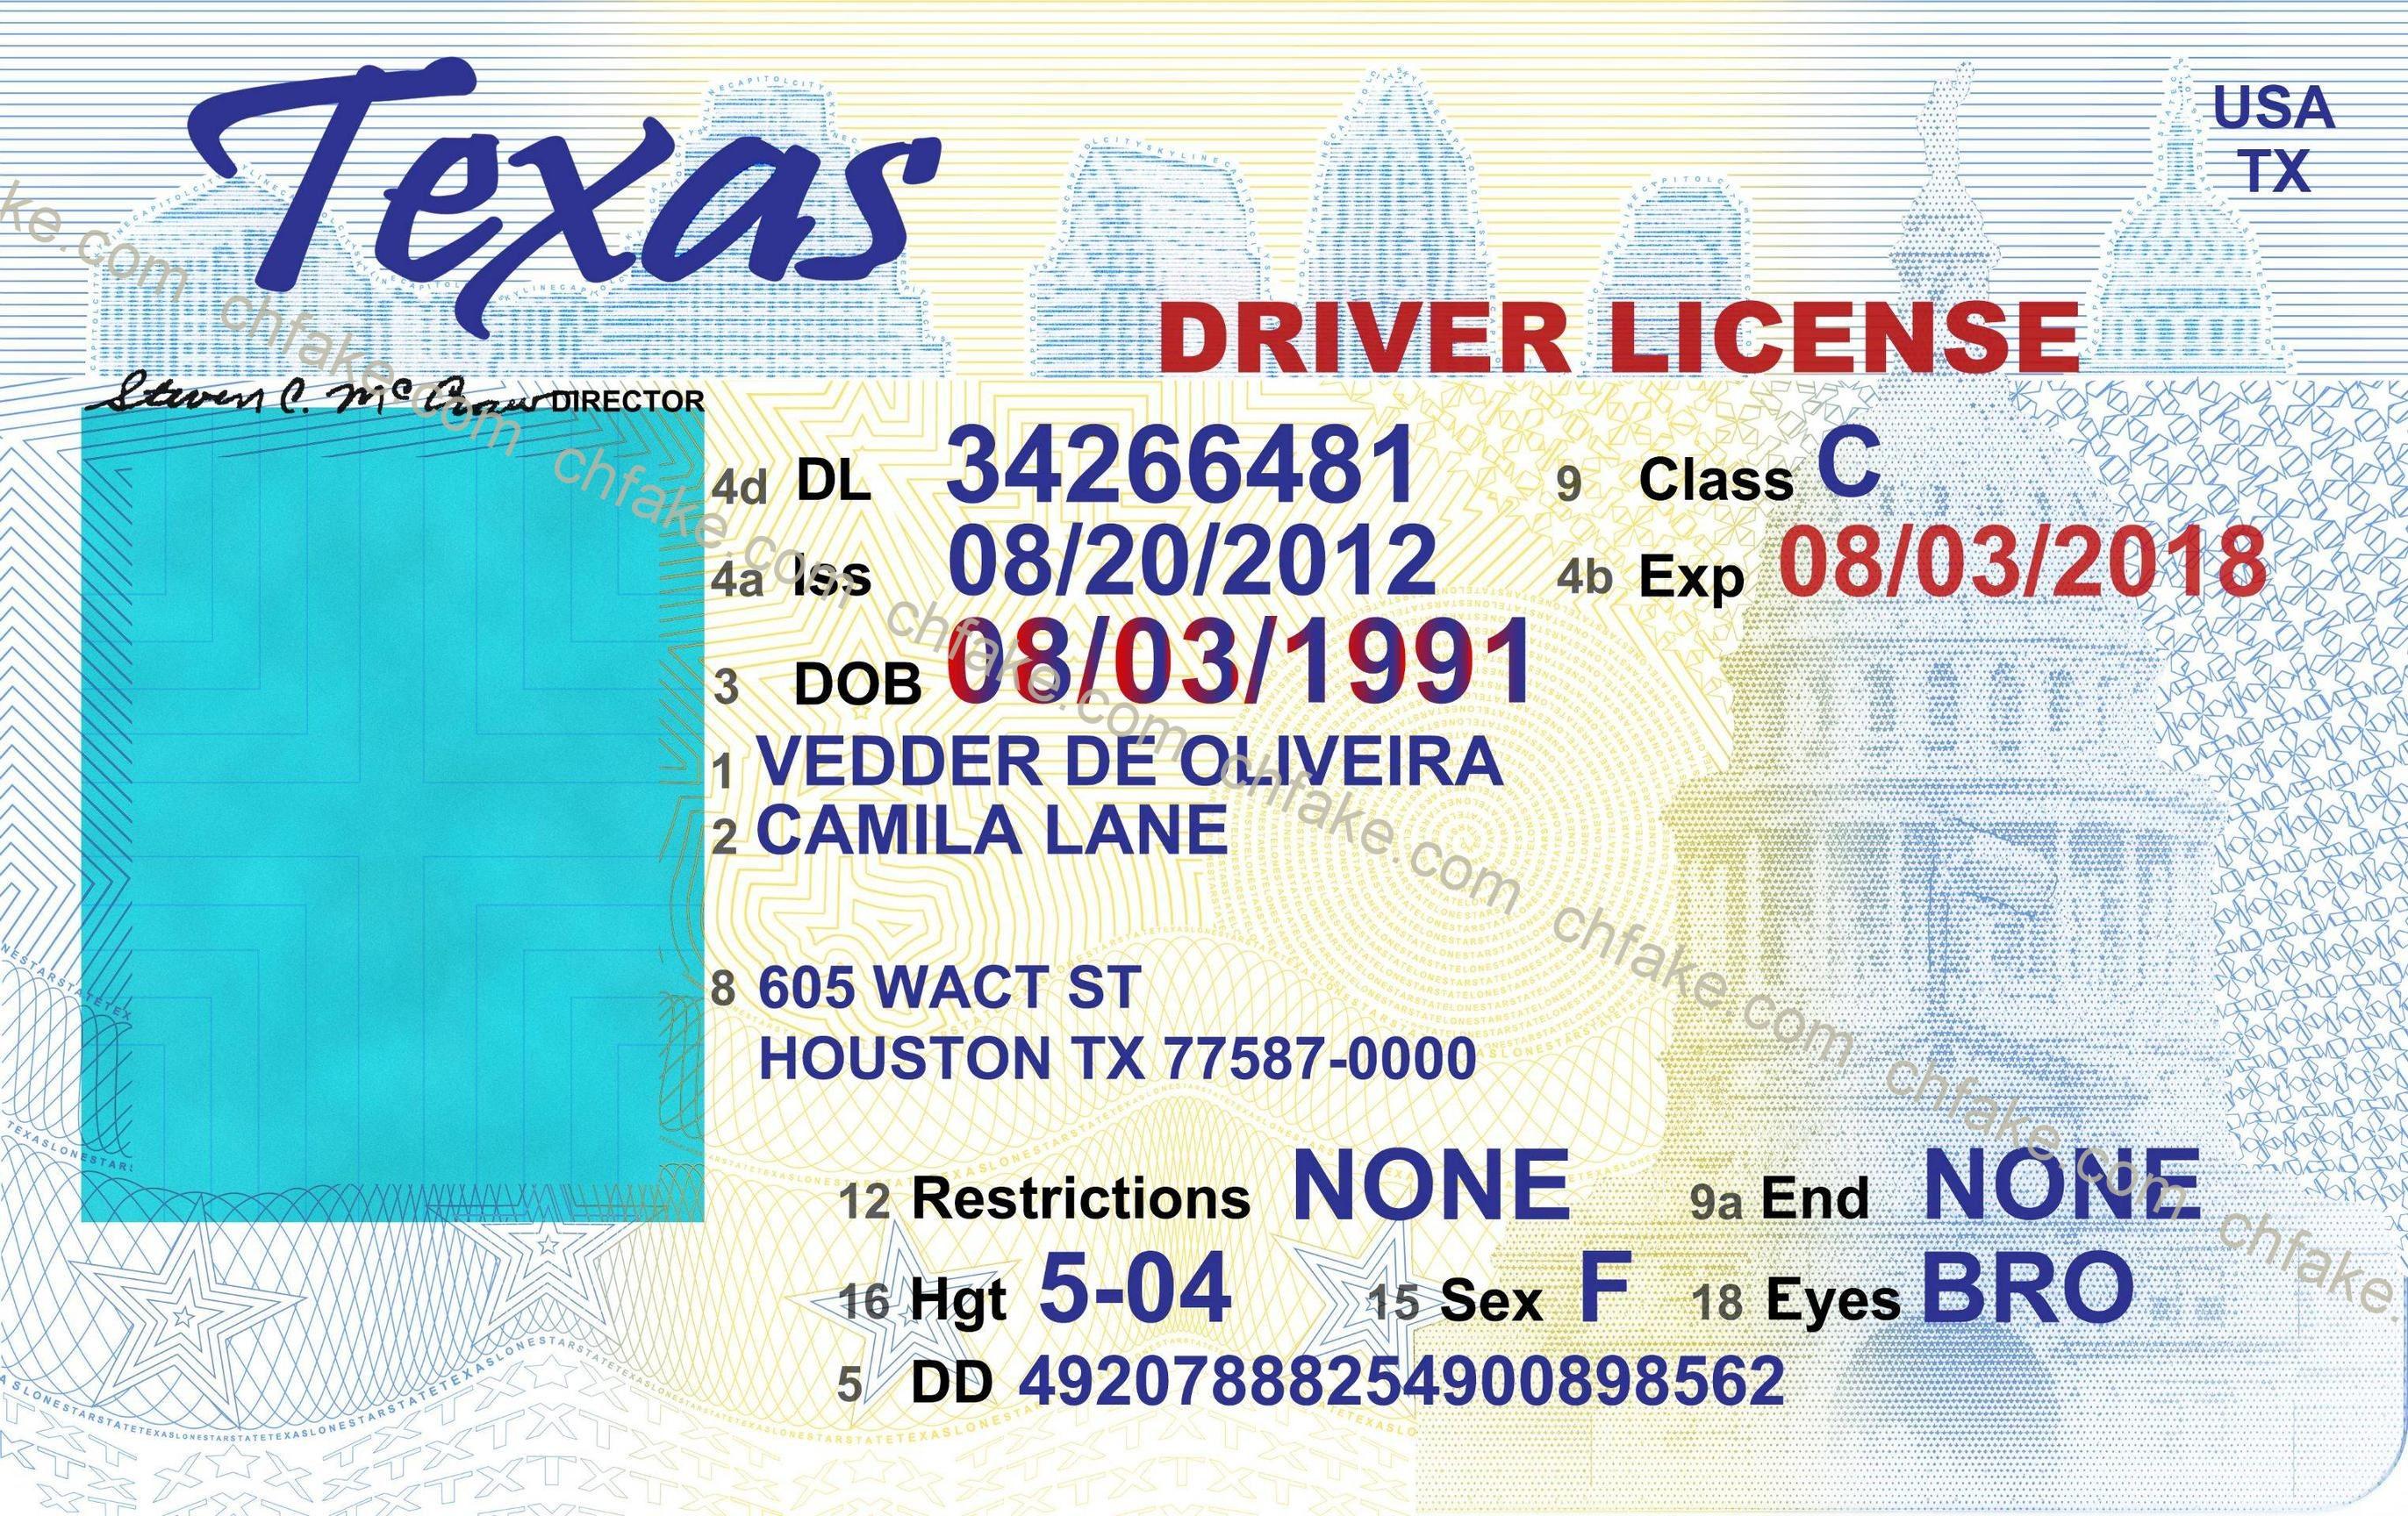 Texas Ids | Buy Fake Id | Scannable Identification - Free Printable Fake Drivers License